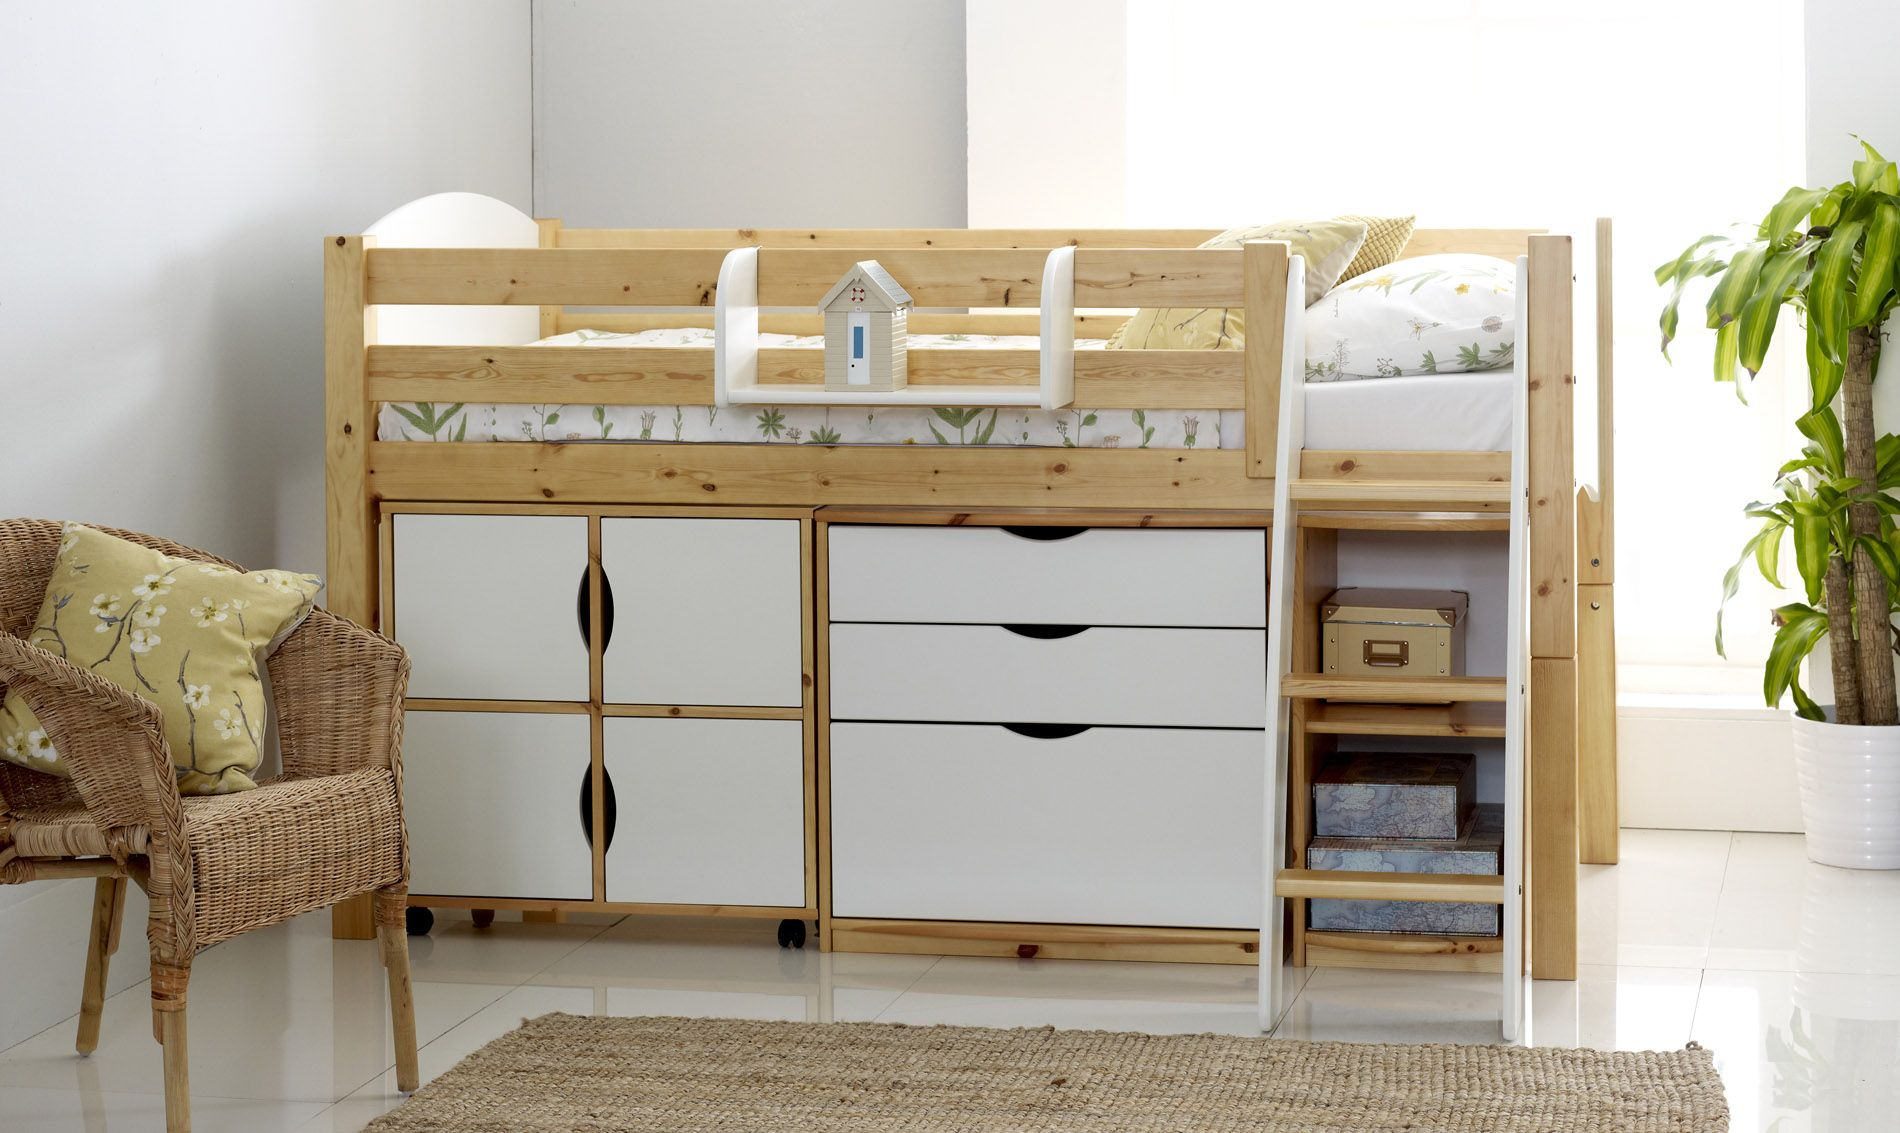 Small Box Room Cabin Bed For Grandma: Scallywag Modular Cabin Beds : Scallywag Modular Cabin Bed